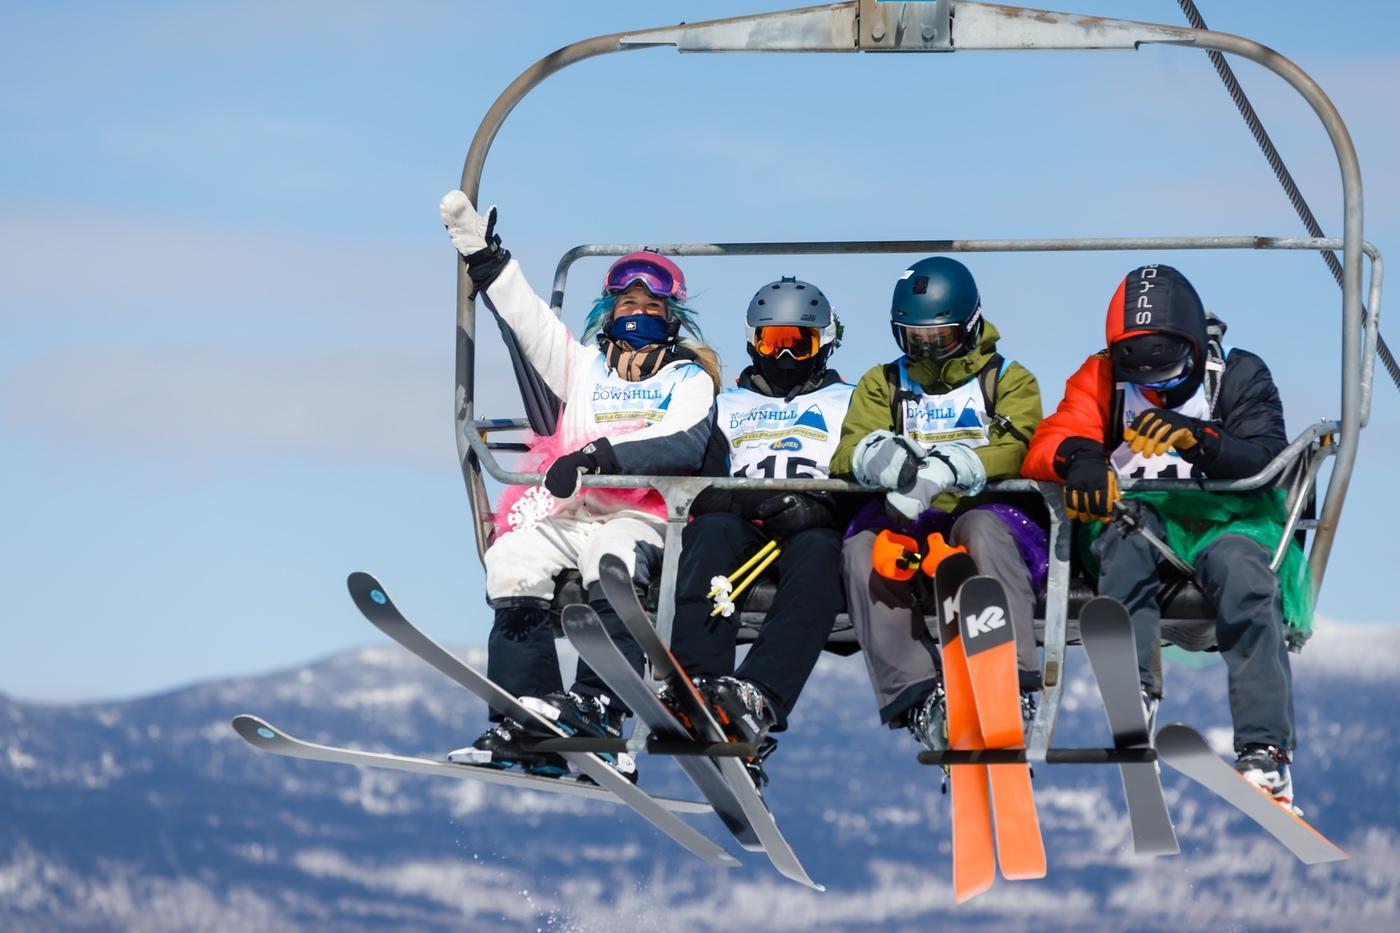 WinterKids Downhill 24 2021 SDP 3234